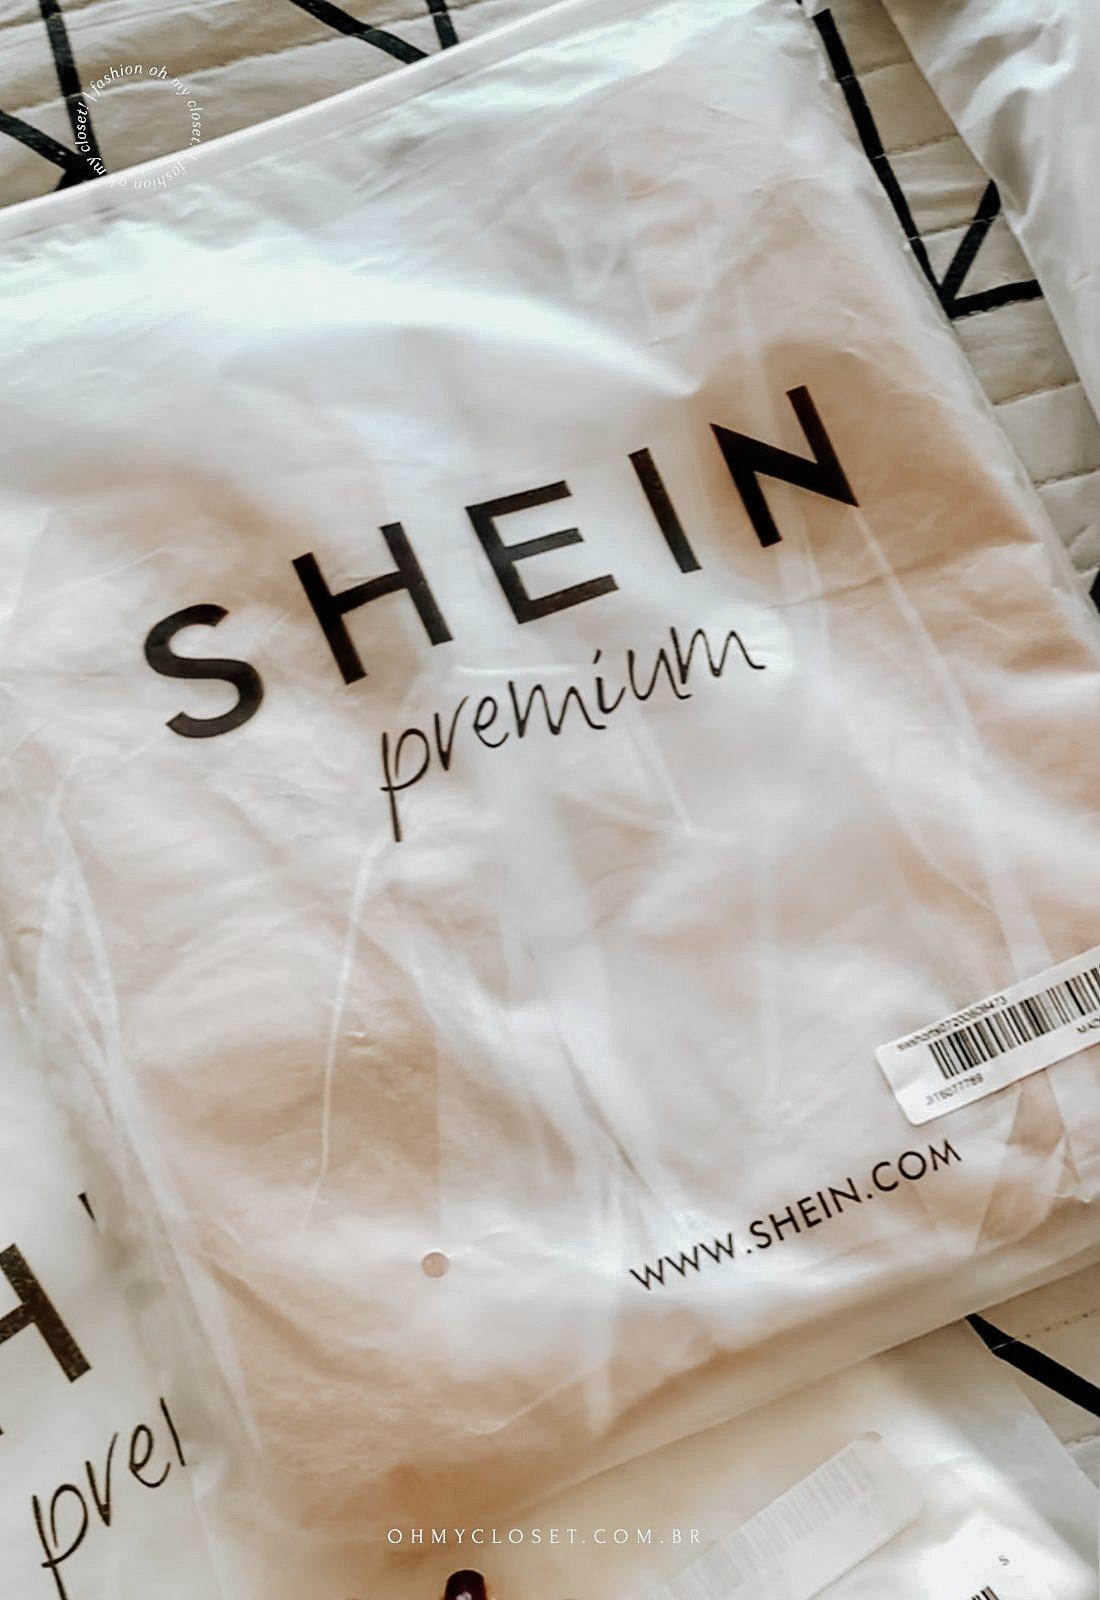 Embalagem da SHEIN premium.